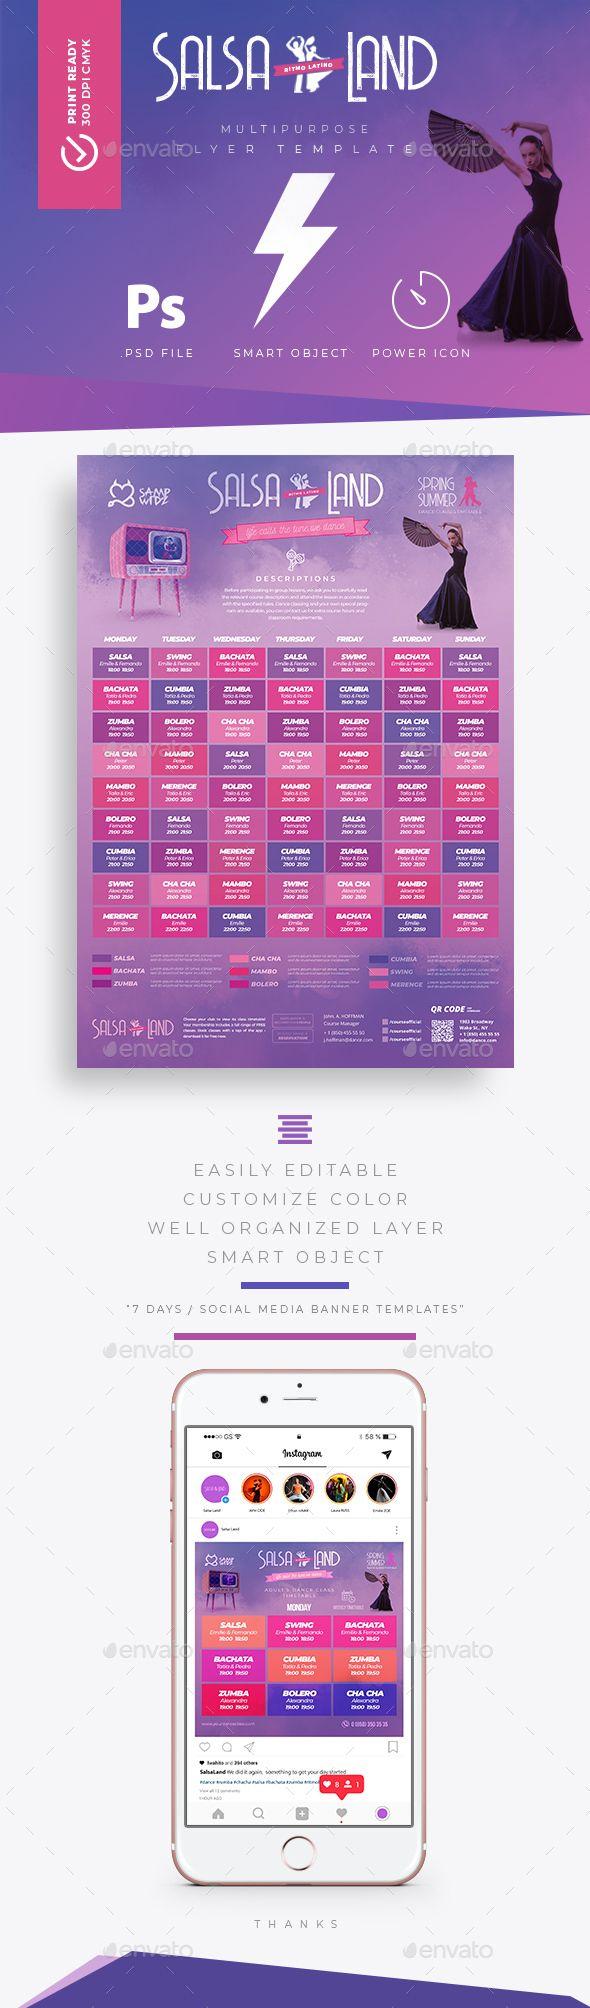 dance class timetable schedule templates best event flyer